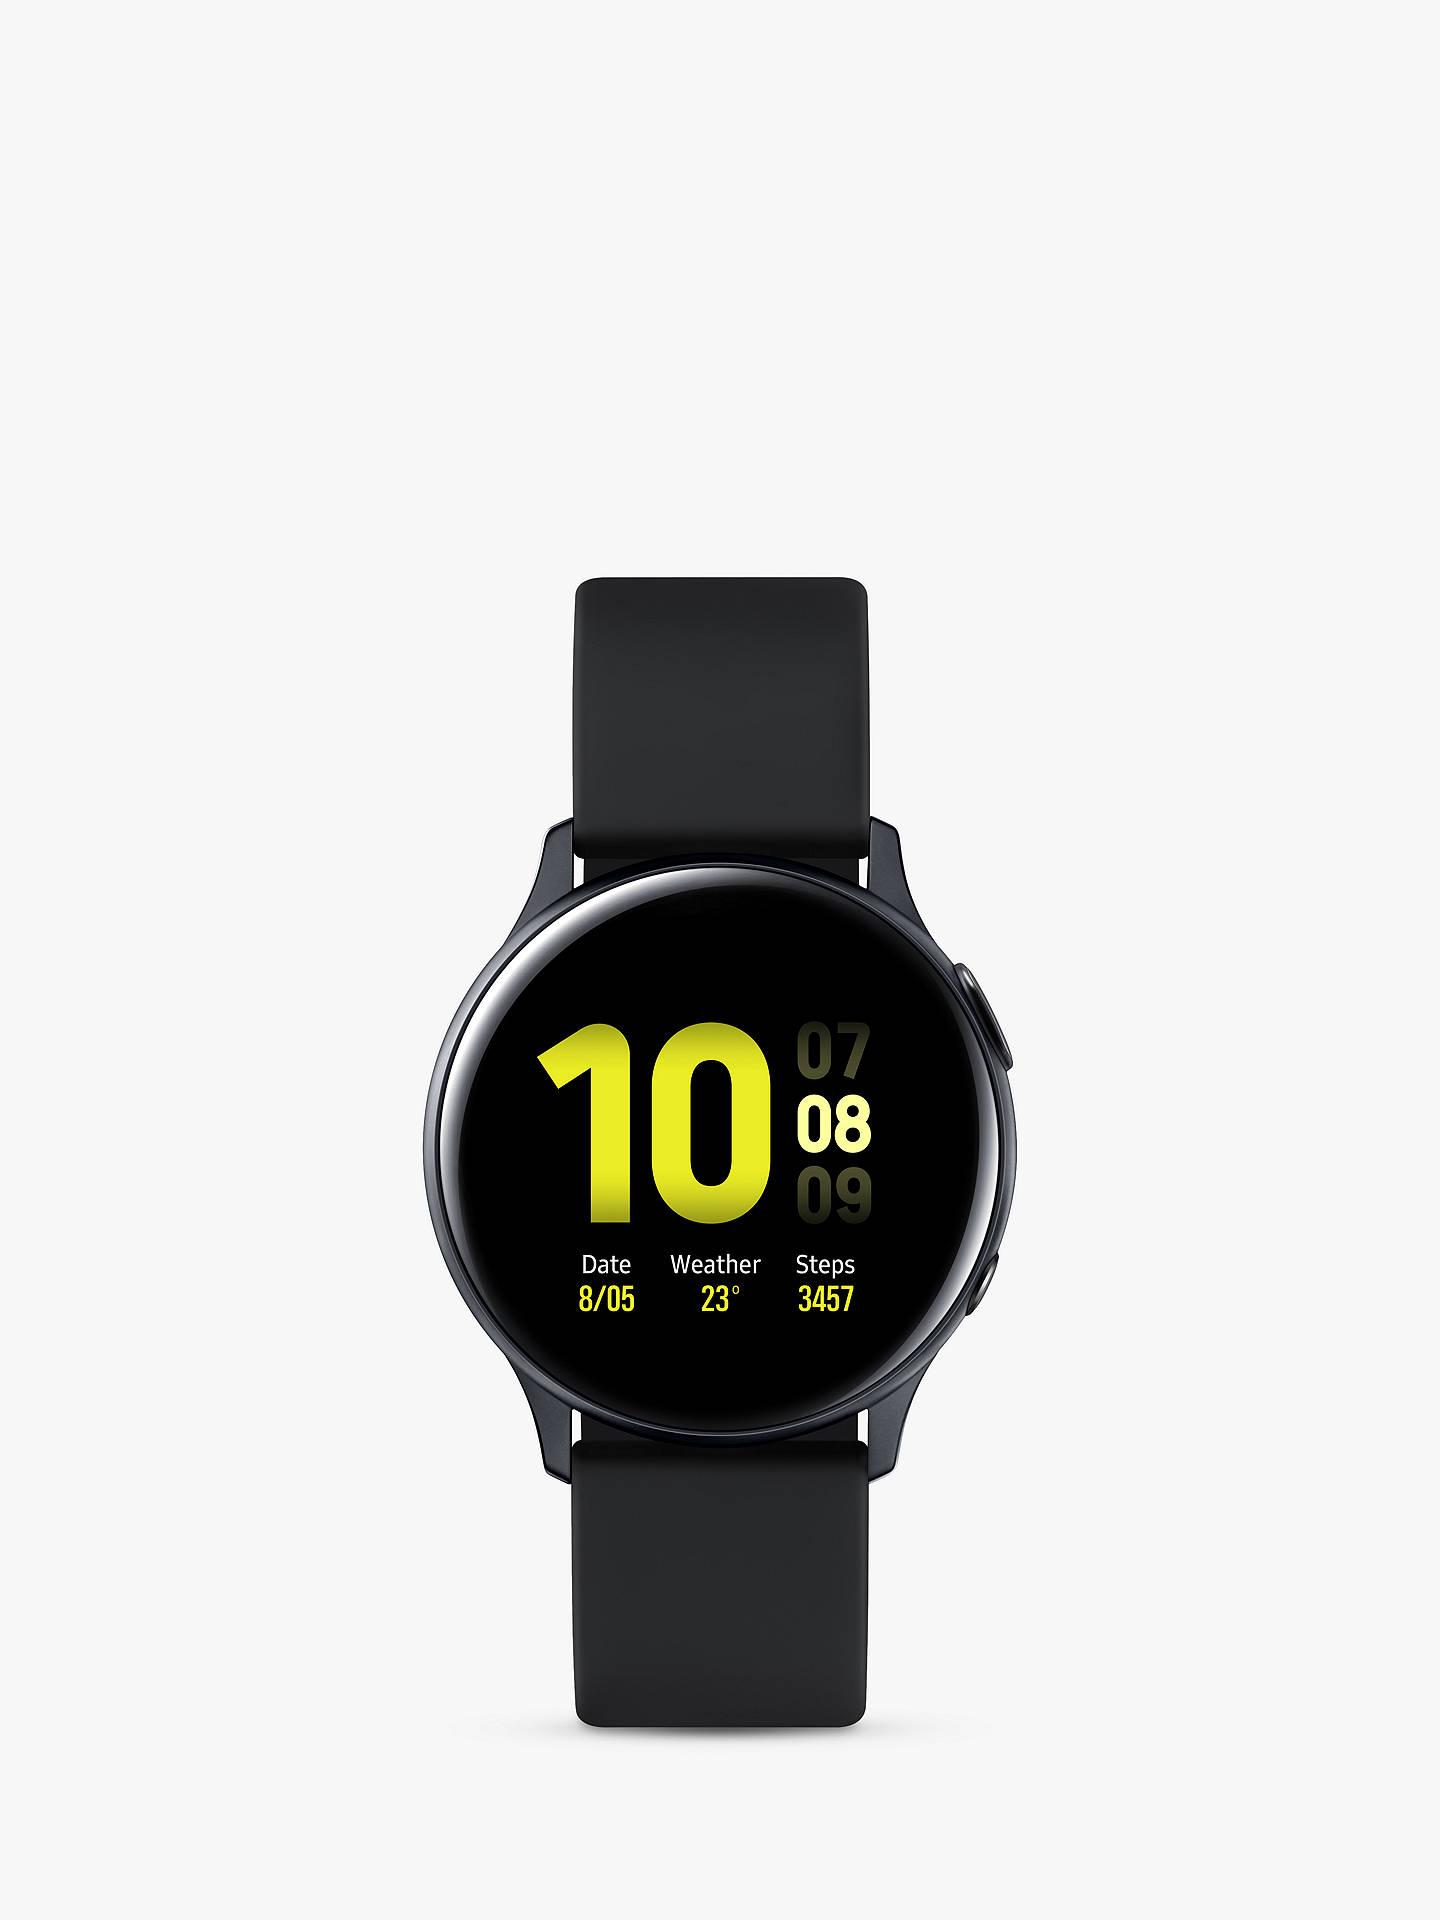 is galaxy active watch 2 waterproof